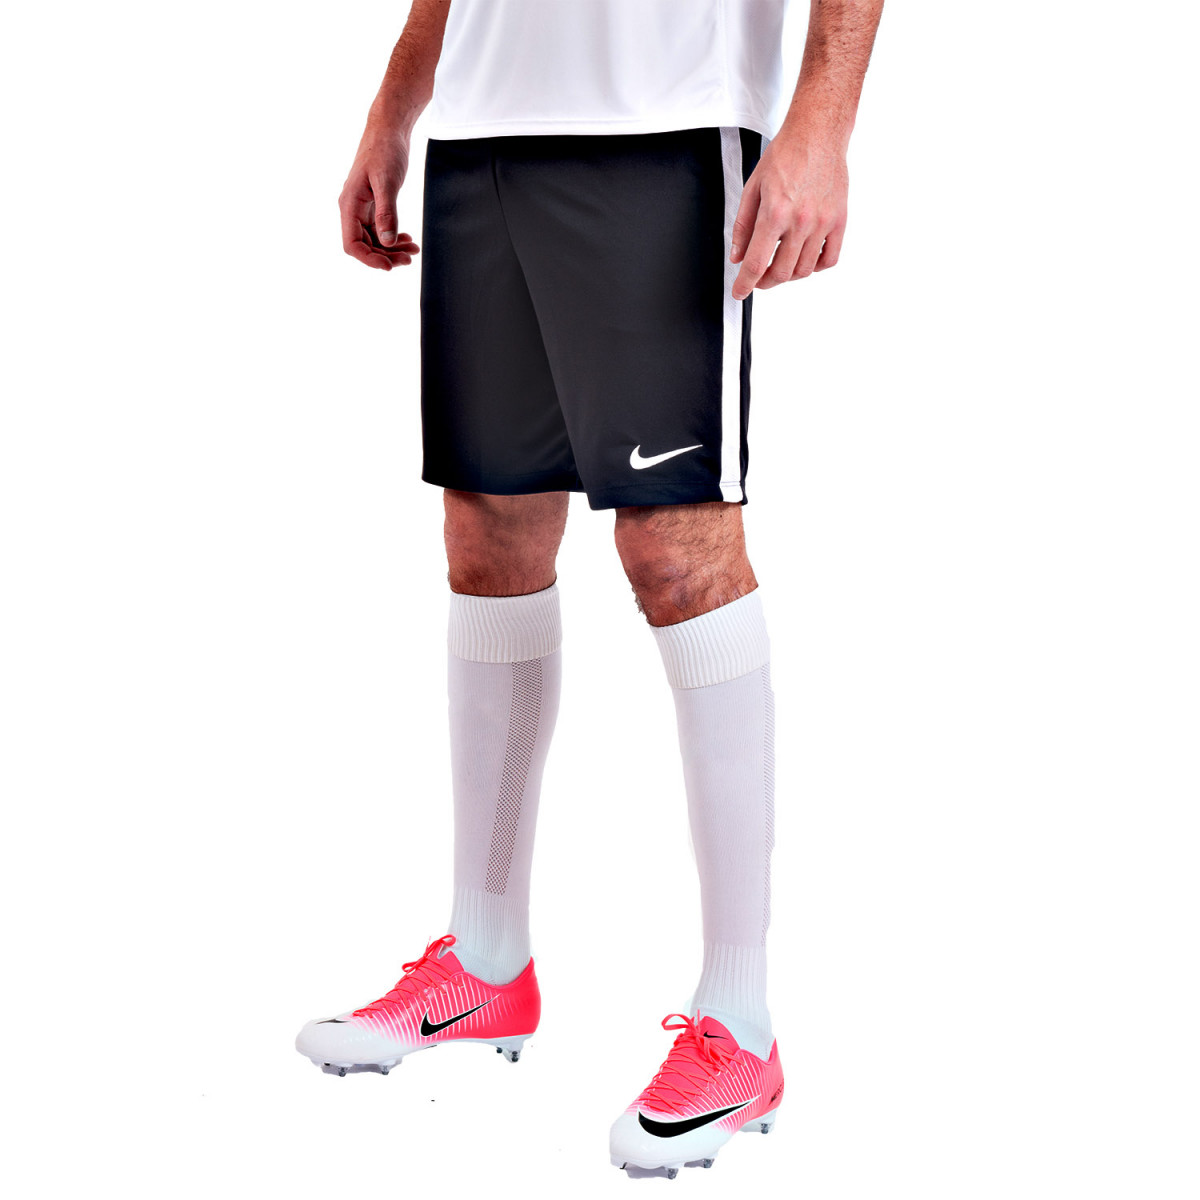 b2d90a6b158e5 Short Nike Dry Academy - Indumentaria Fútbol - Hombre